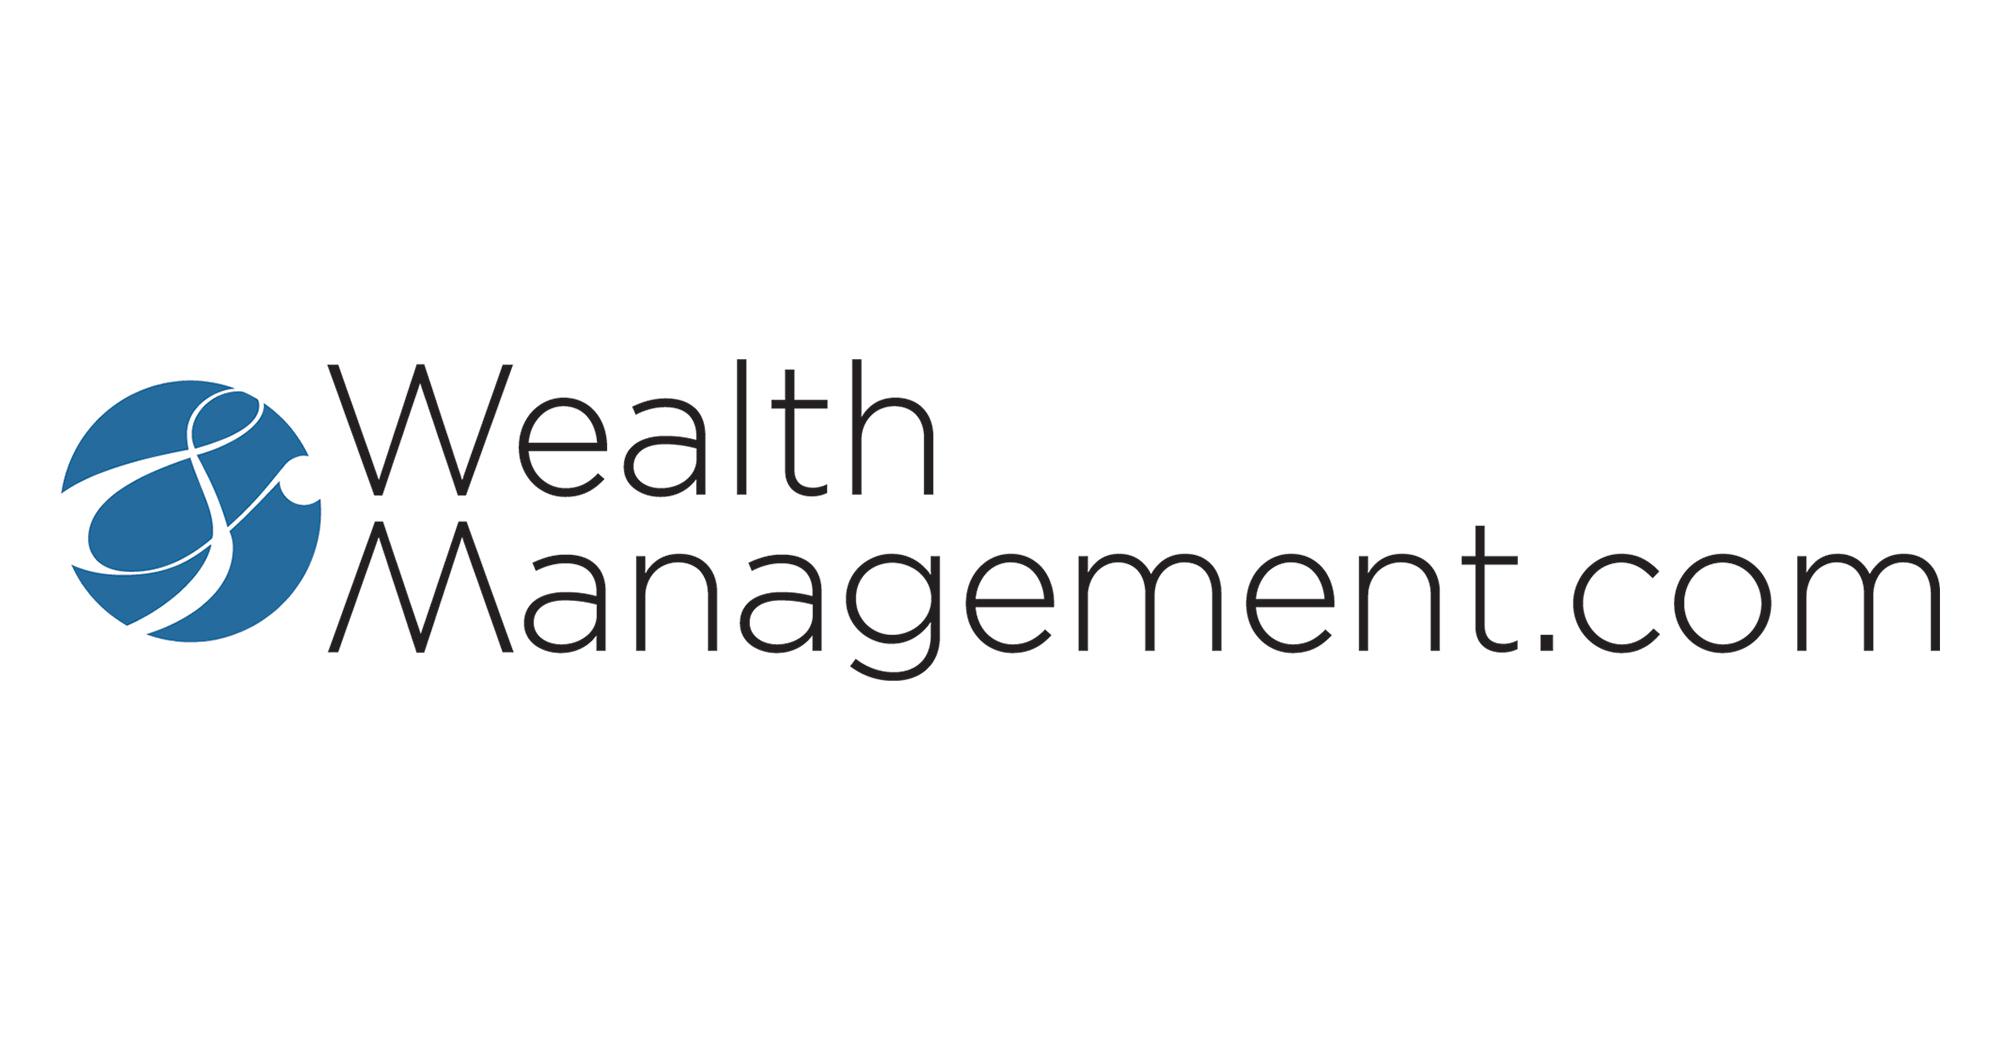 WisdomTree Loans $30 million to AdvisorEngine, Portion Funds Junxure Acquisition + Product Development